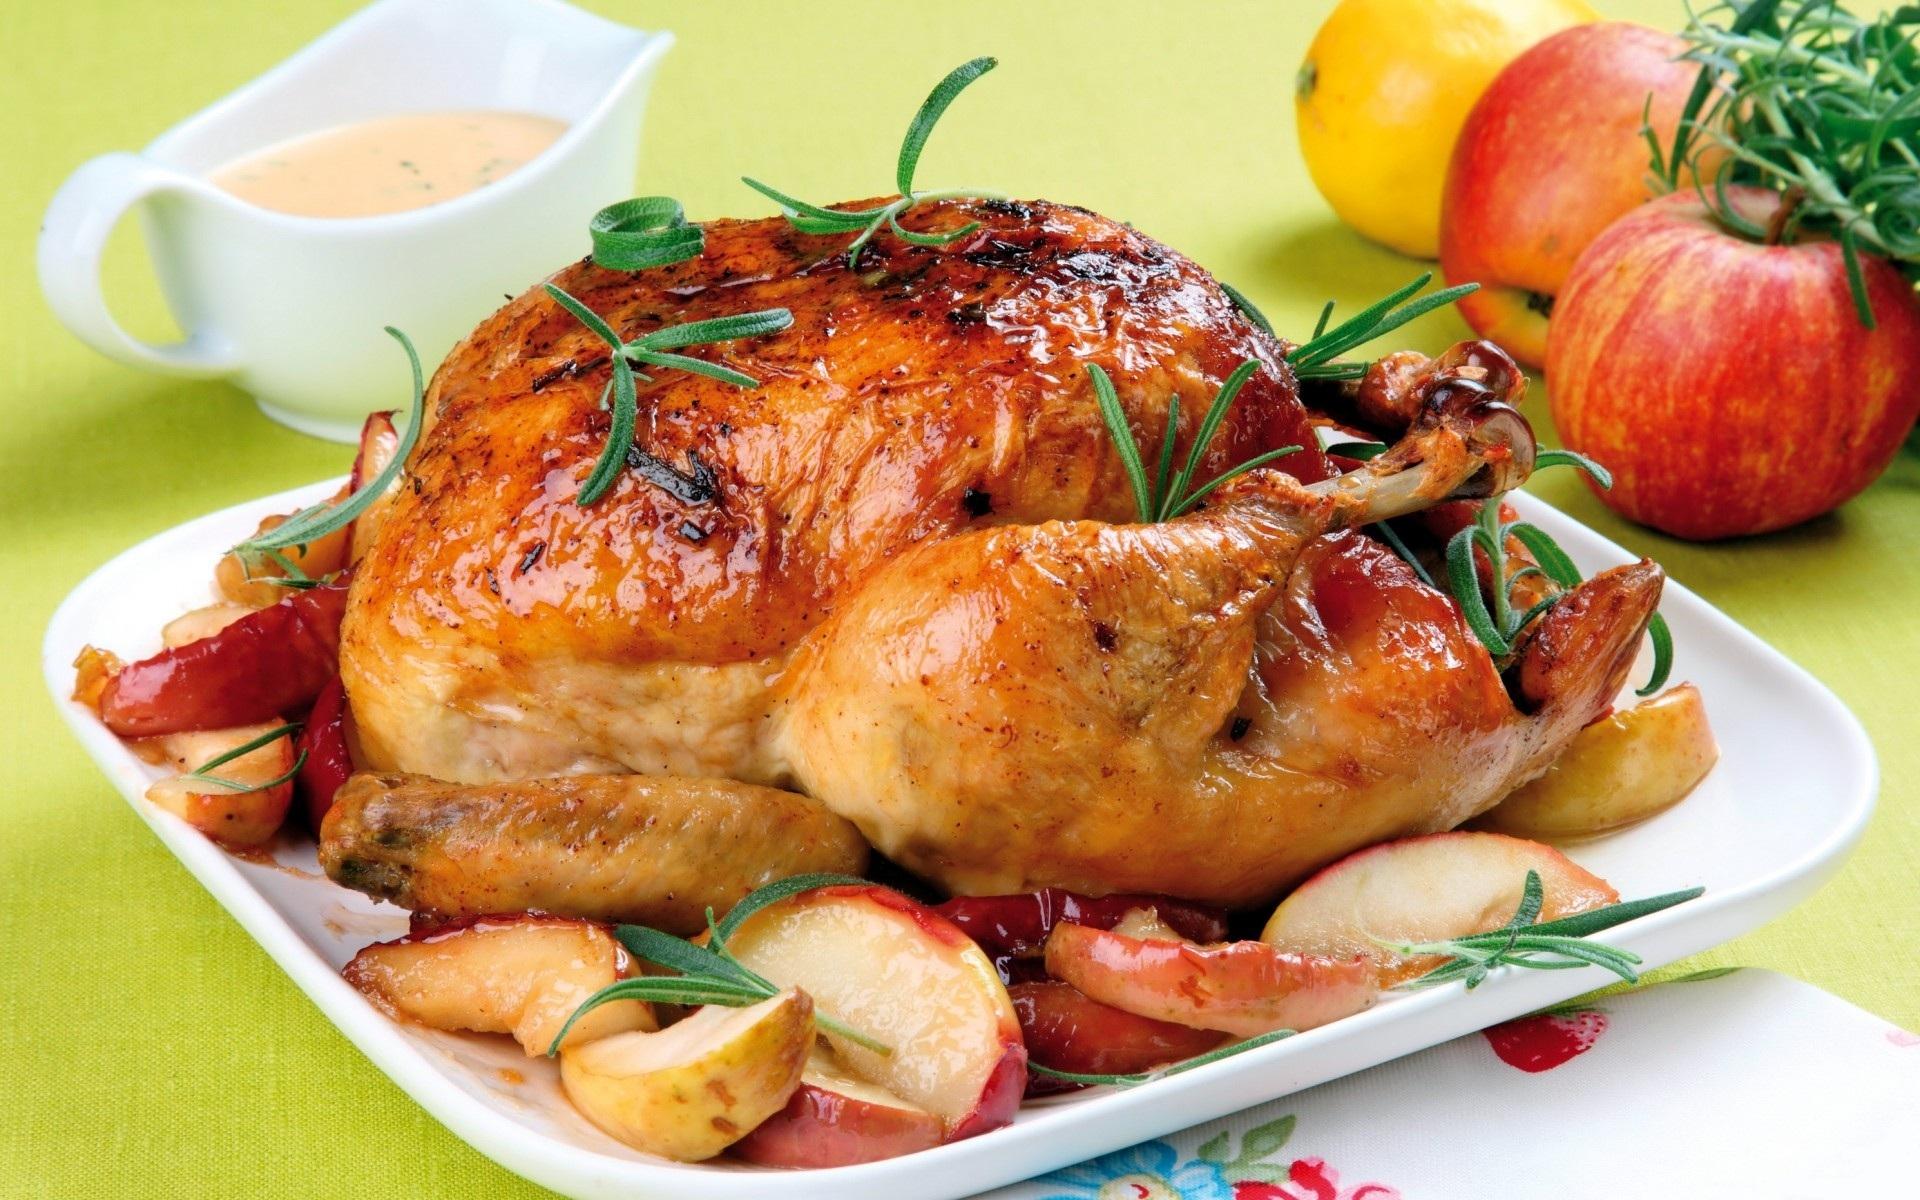 картинки с блюдами из курицы